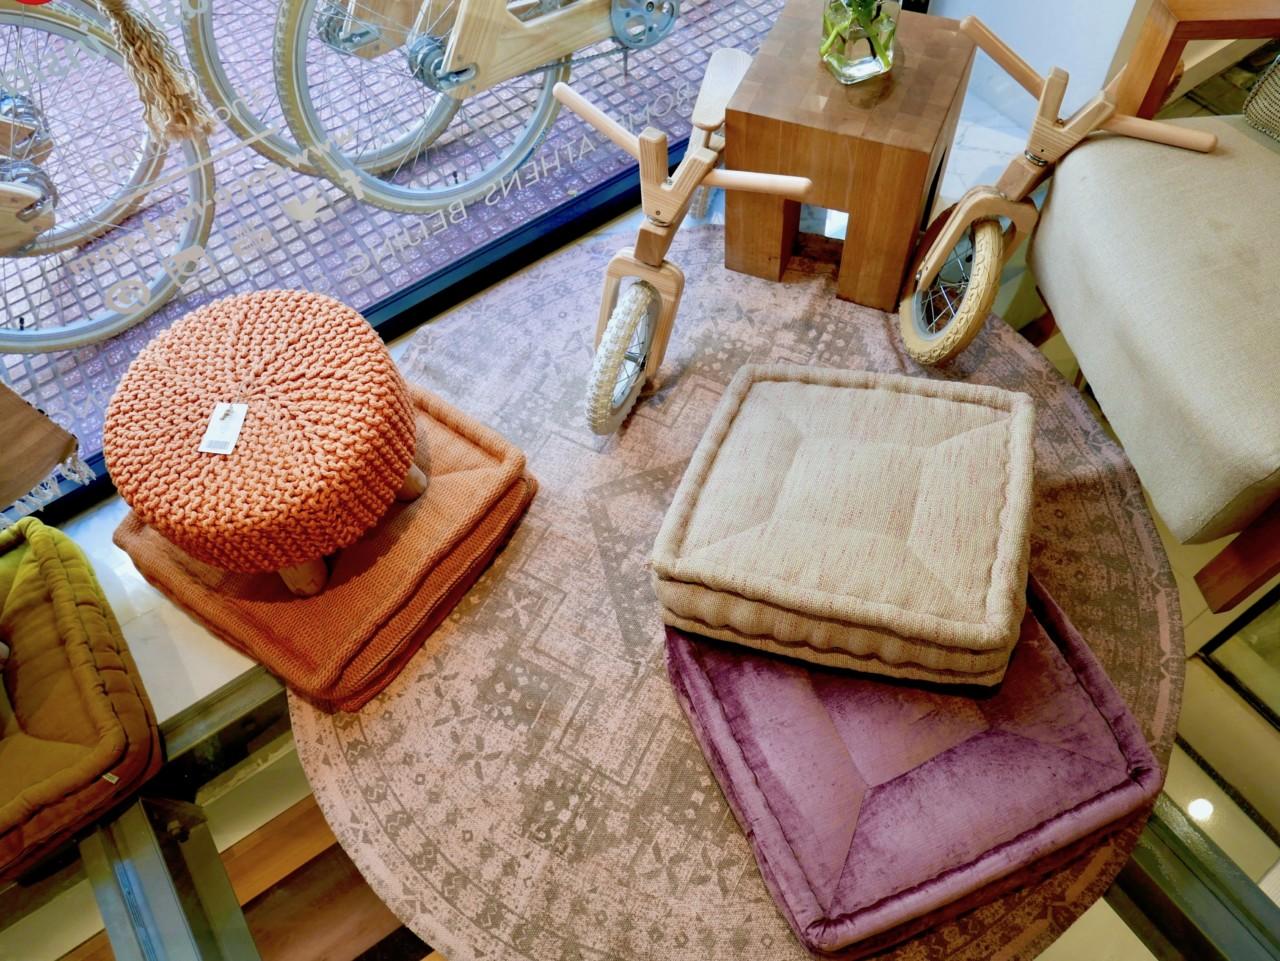 coco-mat-hotel-athens-tataki-teppe-green-house